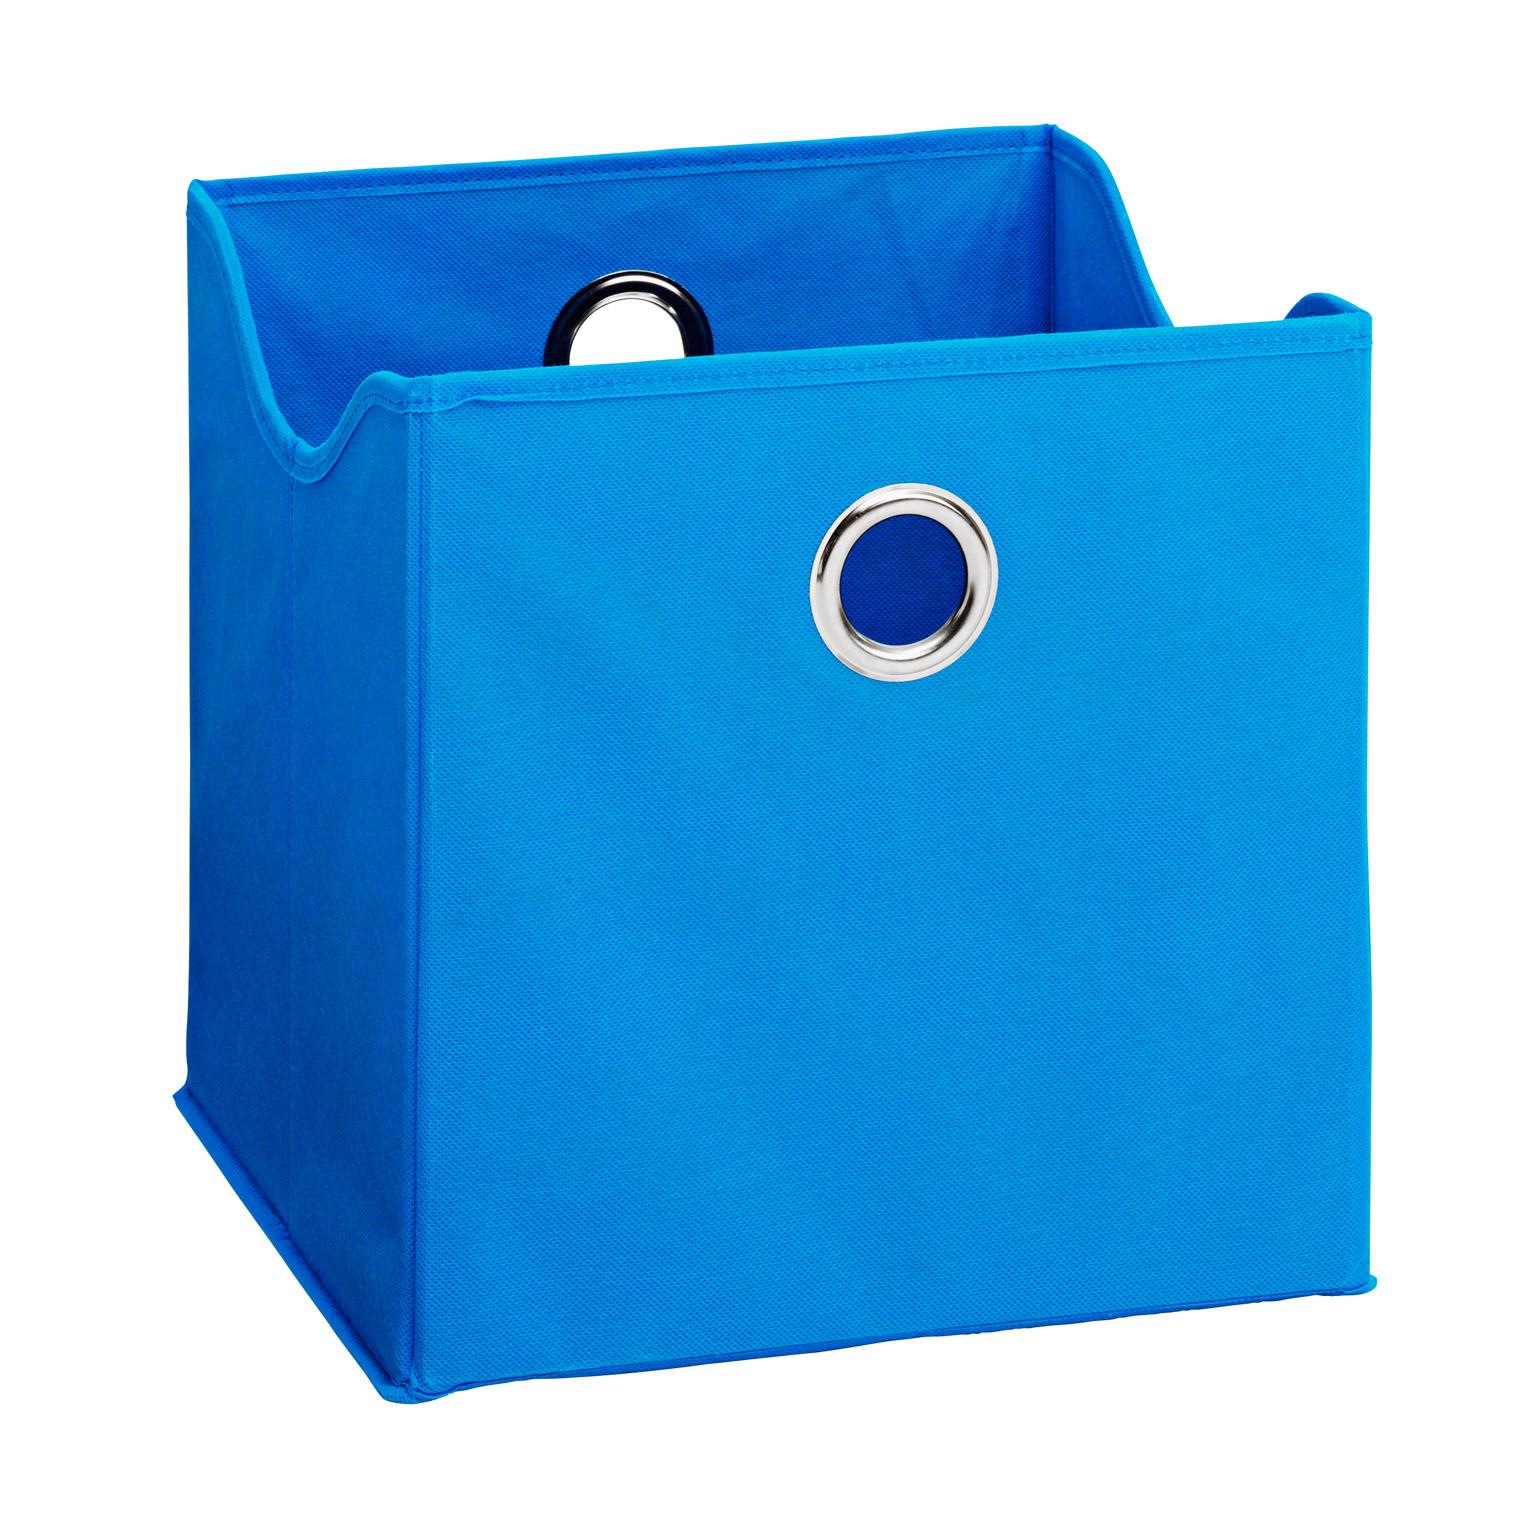 Box Combee (blau)